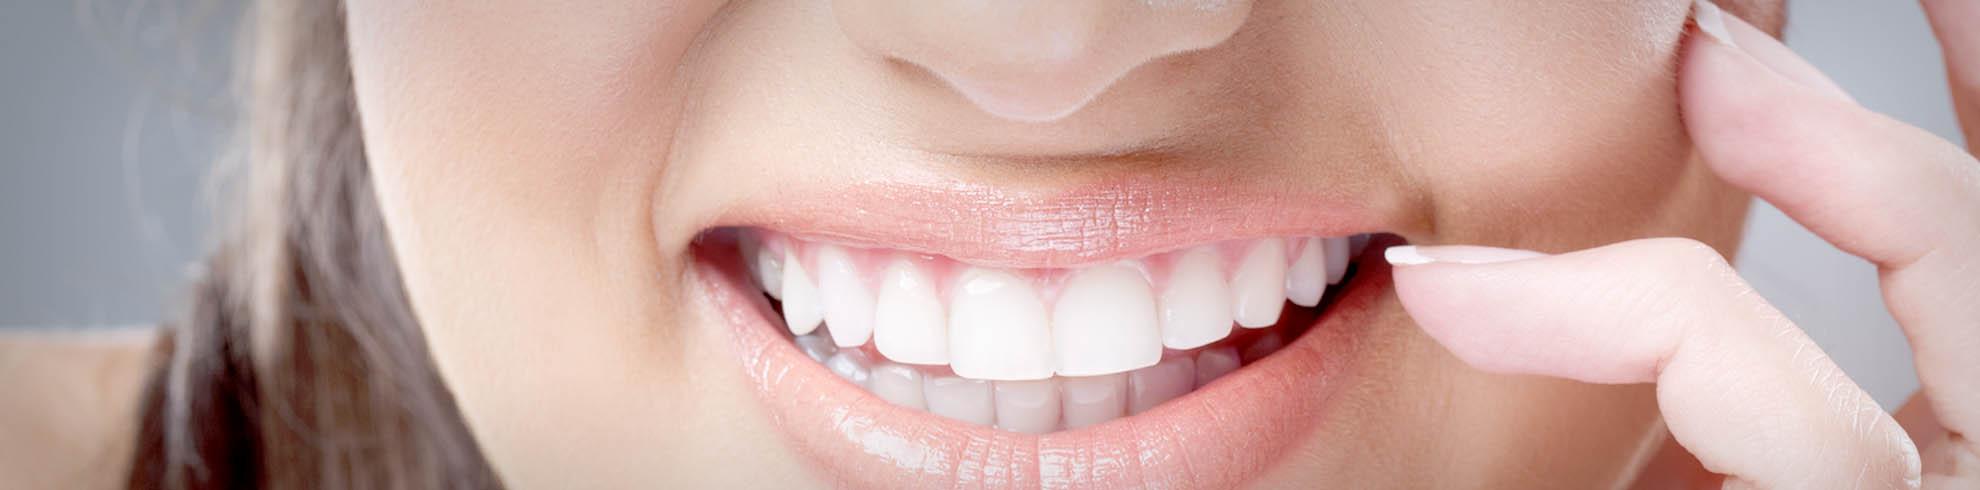 slider-1-clinica-dental-giroca-torrevieja-implantas-blanqueamientos